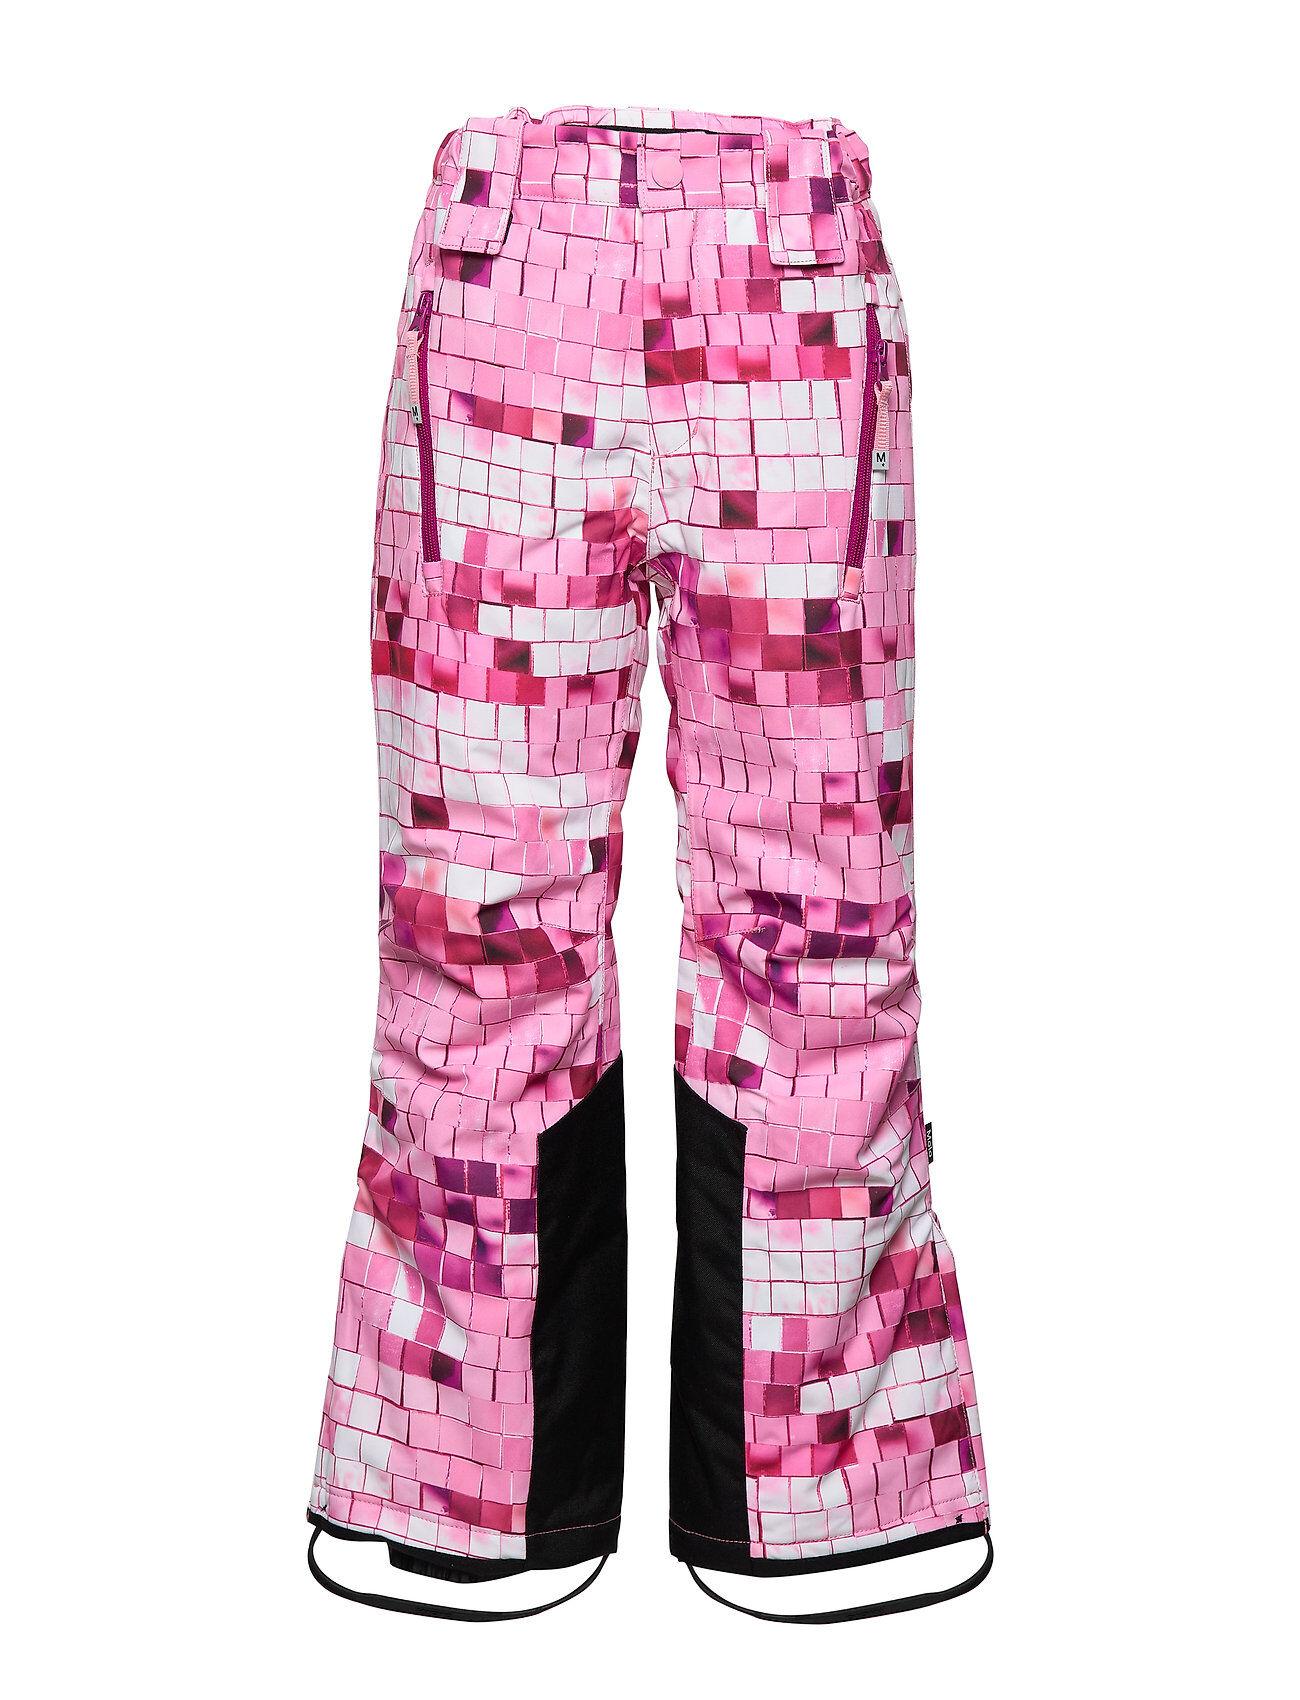 Molo Jump Pro Outerwear Snow/ski Clothing Snow/ski Pants Vaaleanpunainen Molo